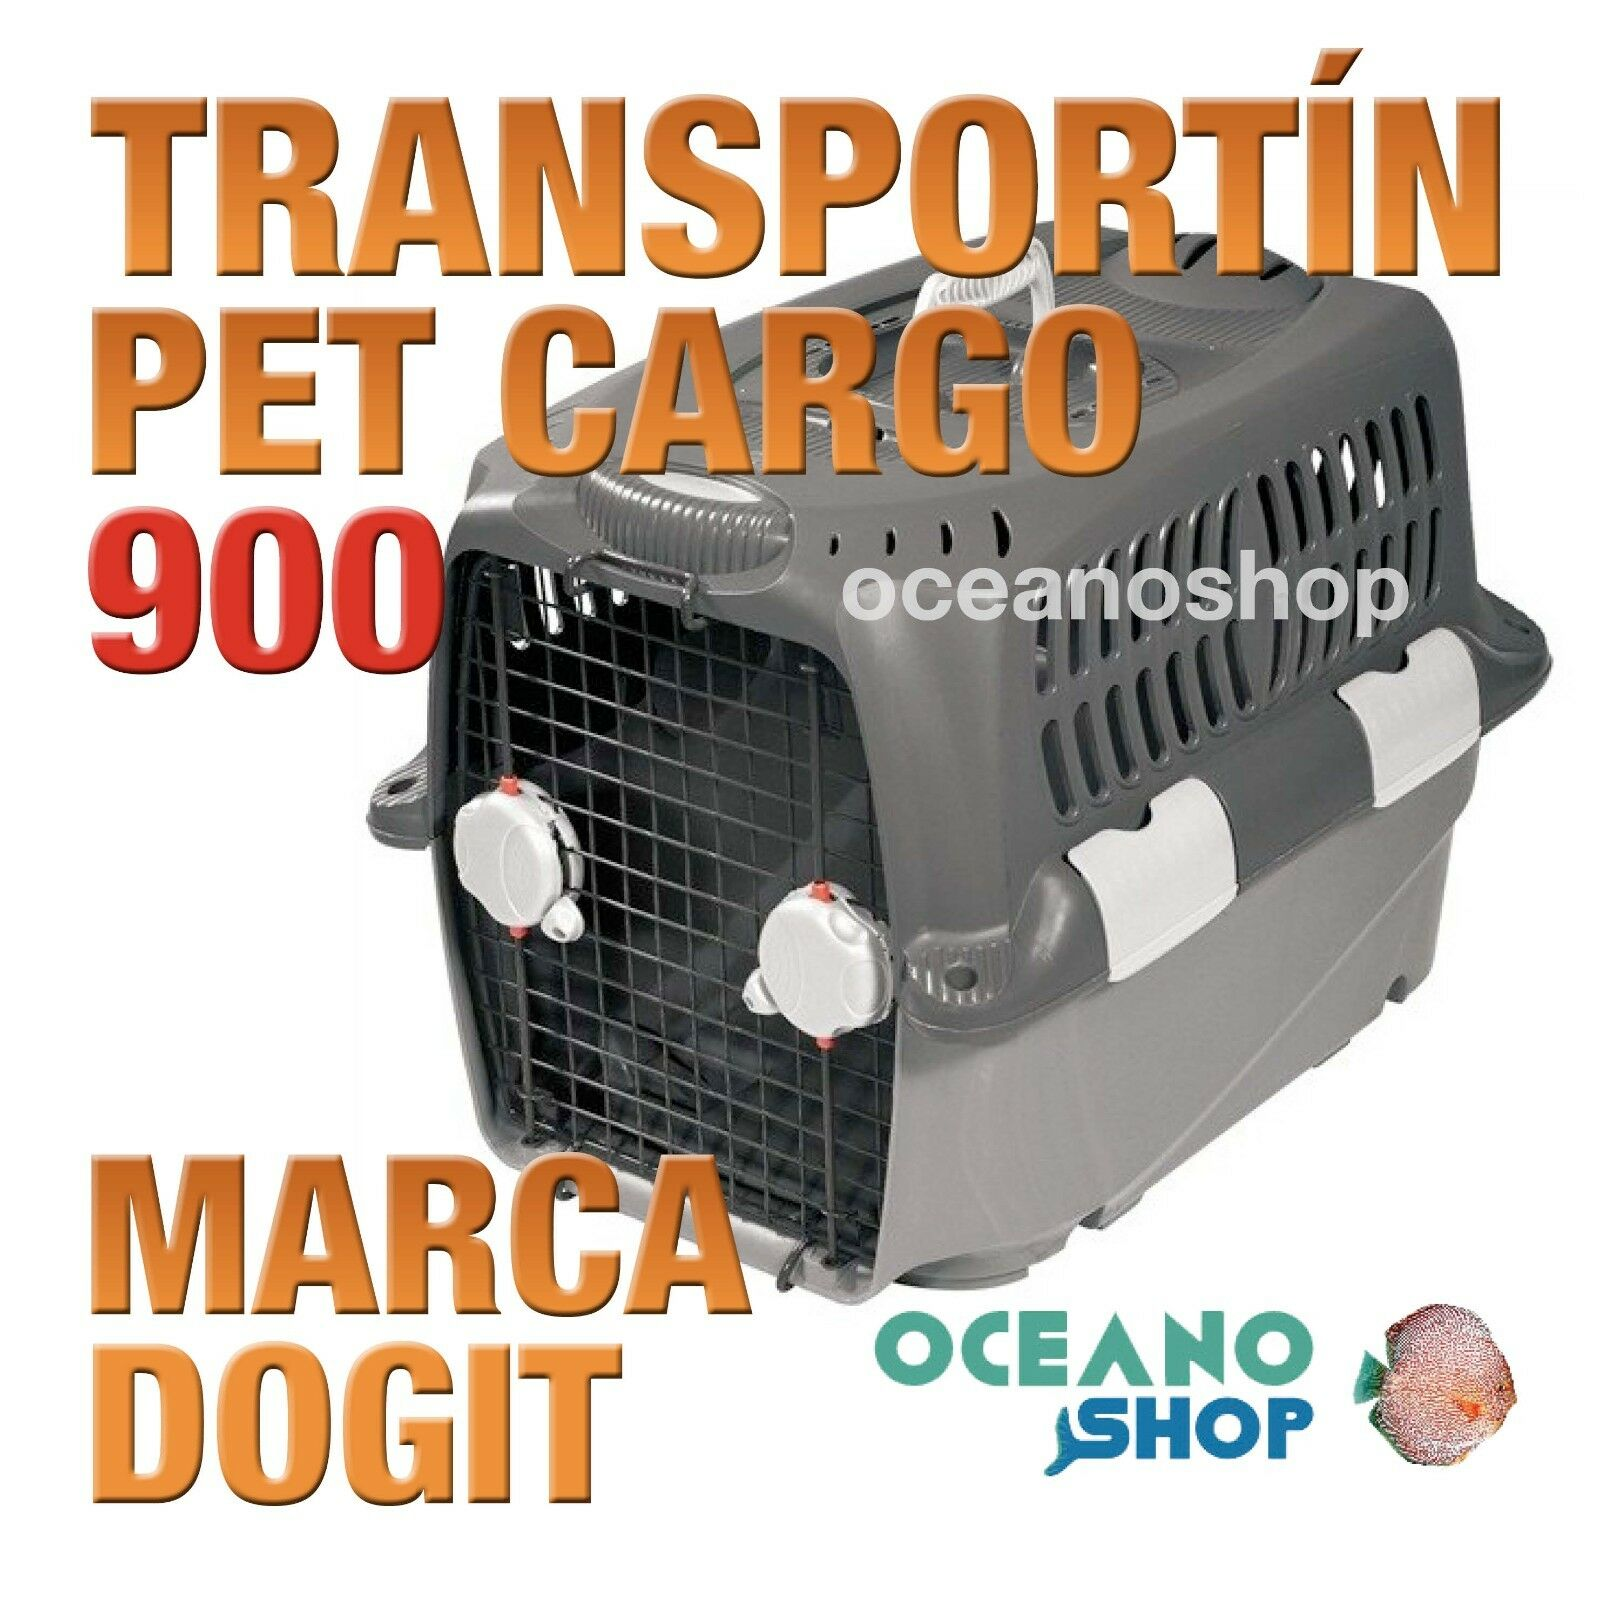 TRANSPORTIN DOGITPETCARGO900